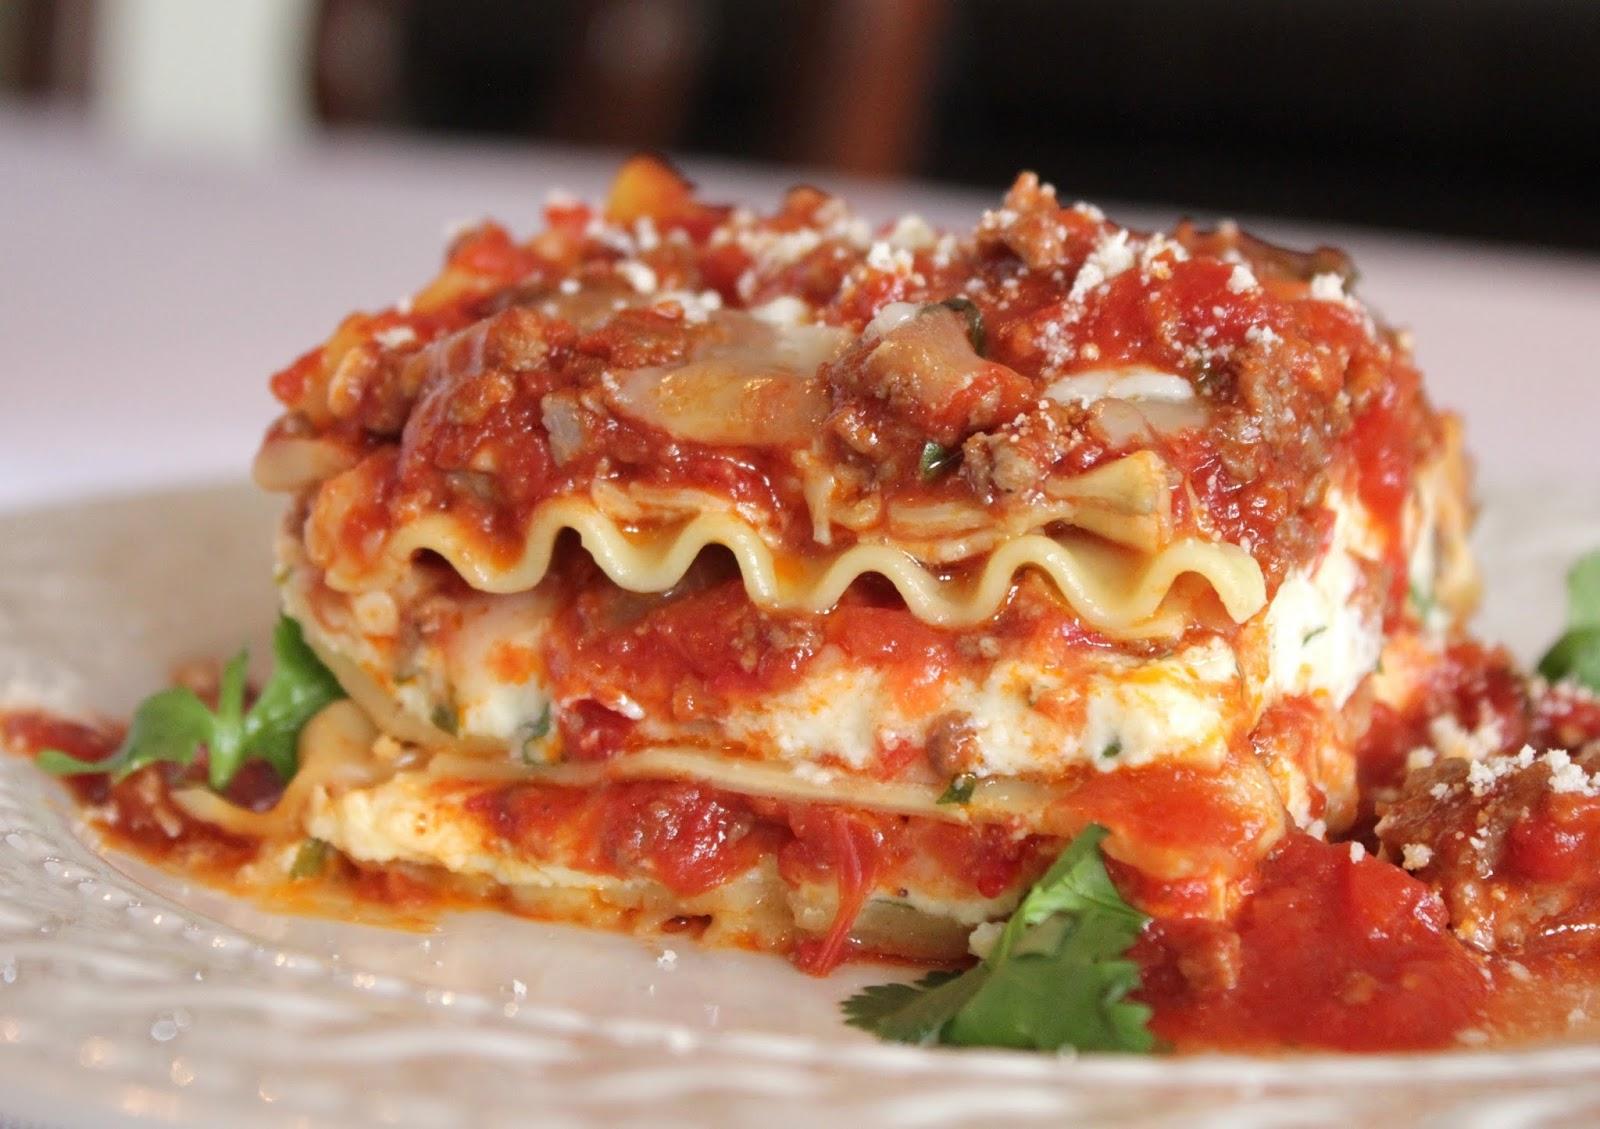 Guglielmo Vallecoccia: Top 5 must eat Famous Italian Food